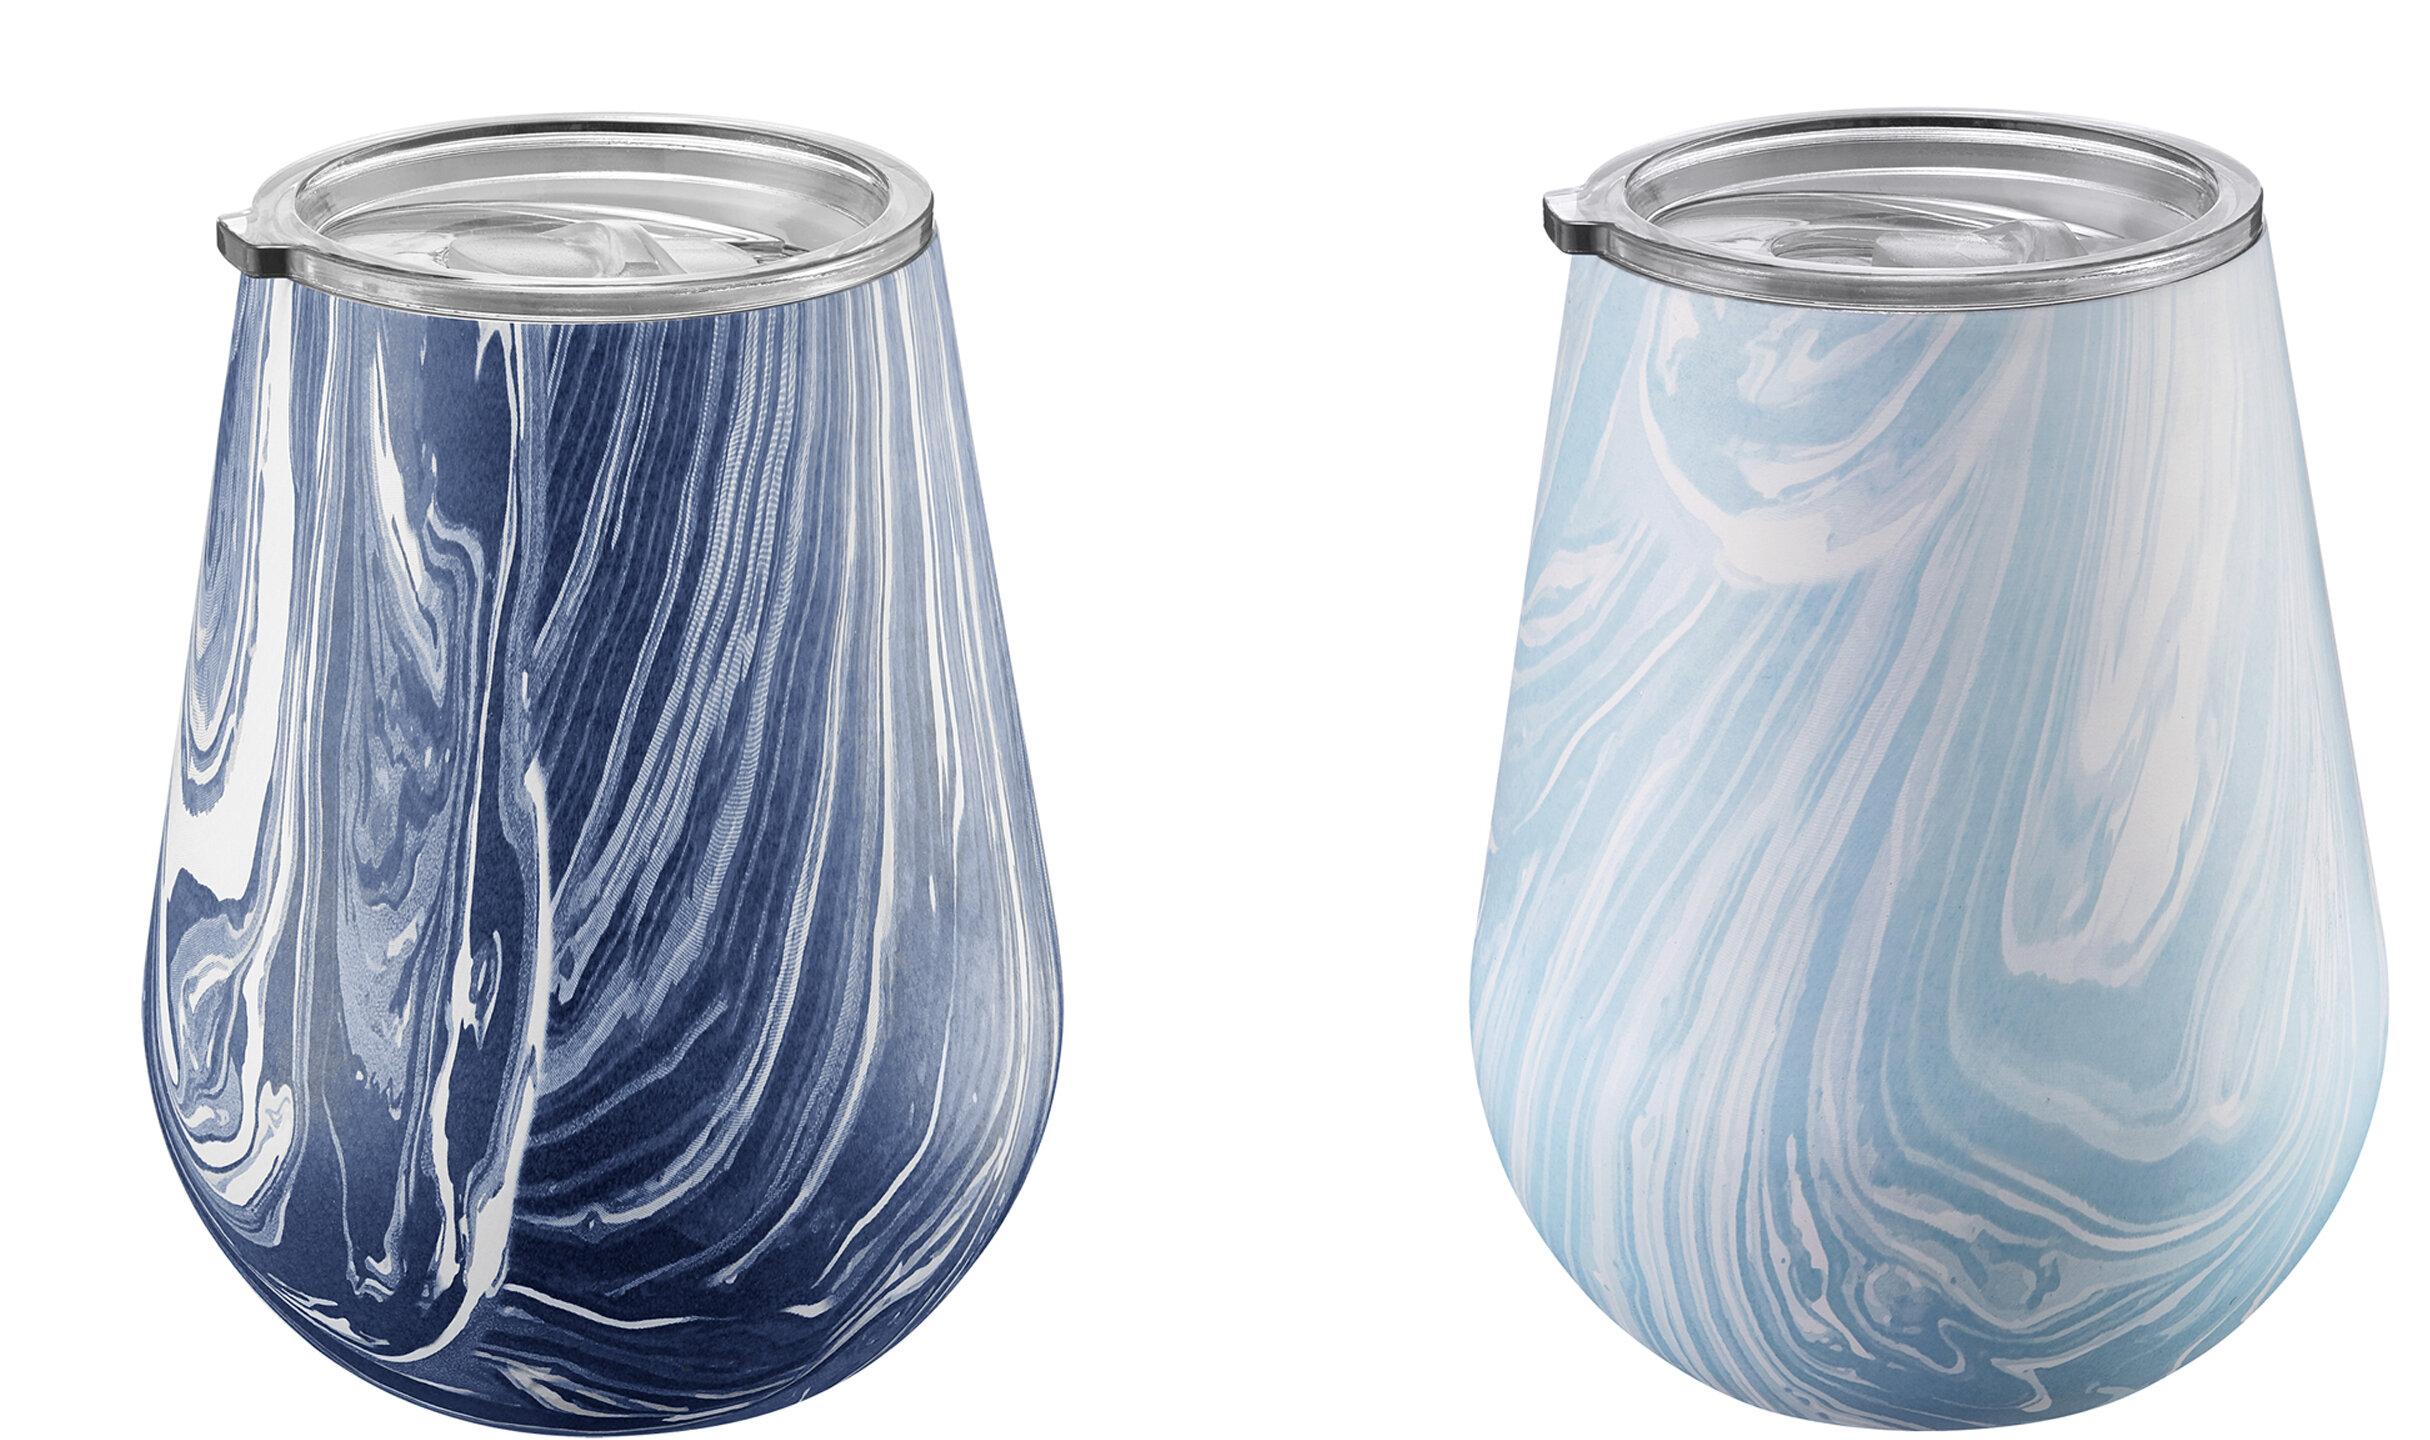 77b0d6eed45 Wrought Studio Raiford 14 oz. Stainless Steel Stemless Wine Glass ...